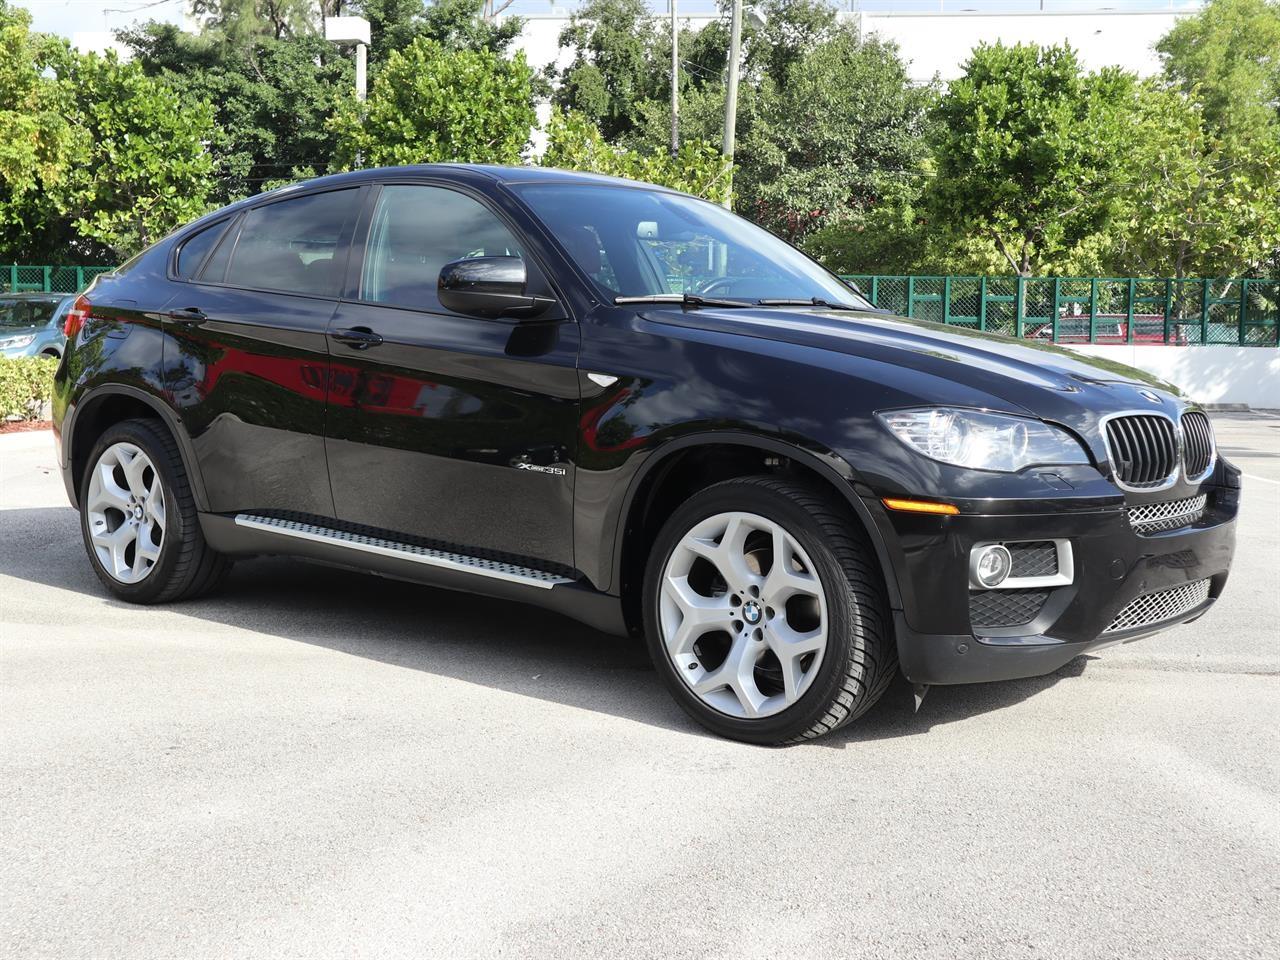 2014 BMW X6 AWD 4dr xDrive35i 7900 miles 2 Seatback Storage Pockets 4 Person Seating Capacity 5